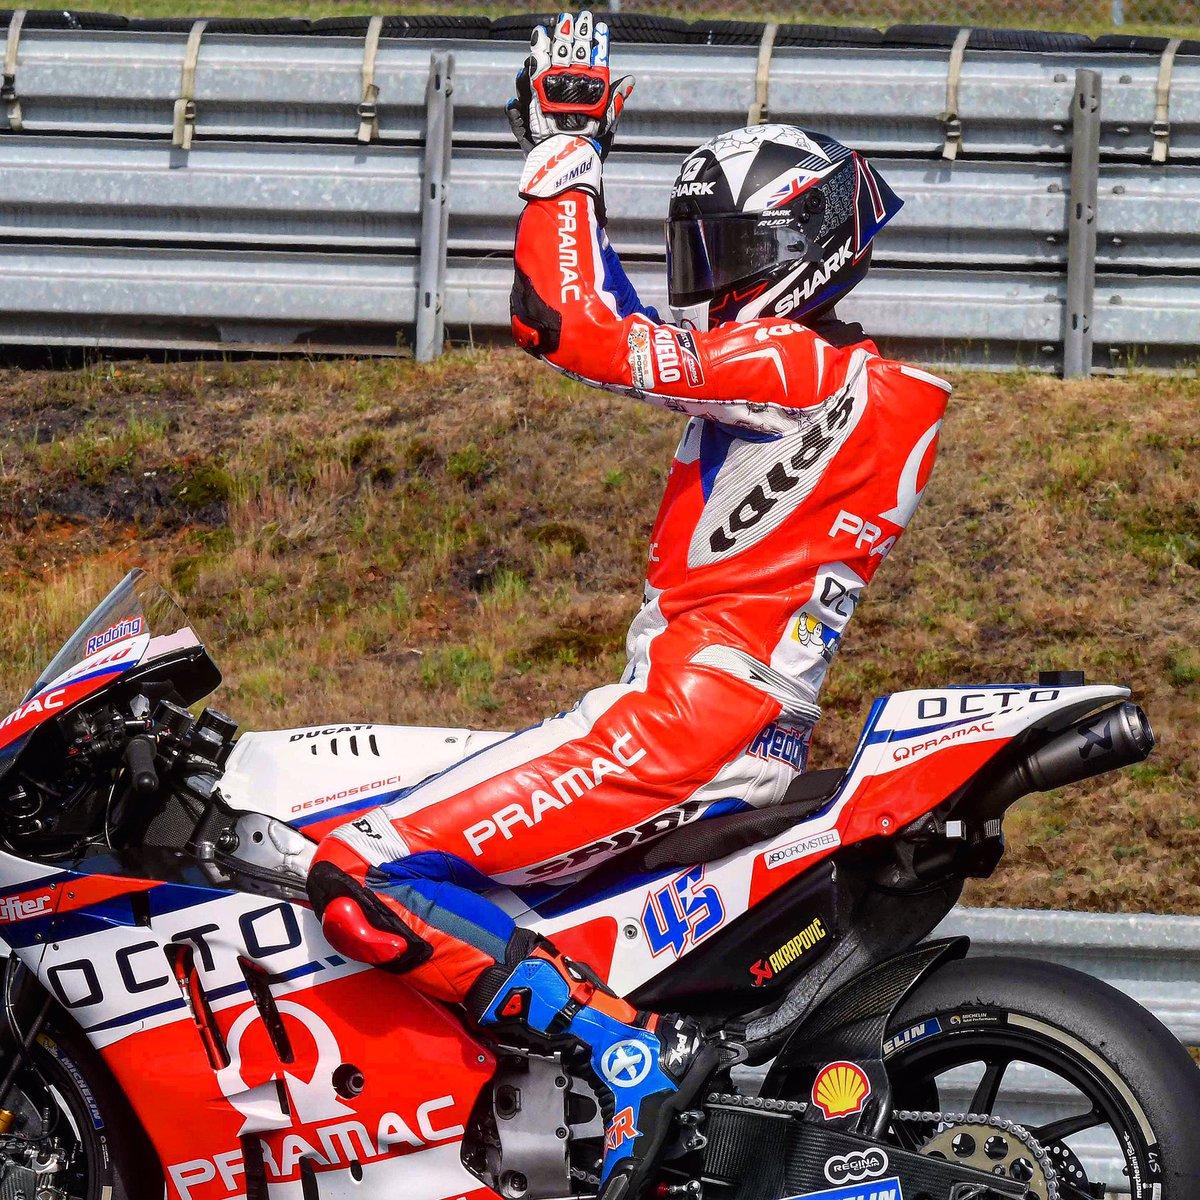 Enthusiasm @Reddingpower #FrenchGP @MotoGP @pramacracing #speed #bikes #bikers #race #ridetrue #spidiwarrior